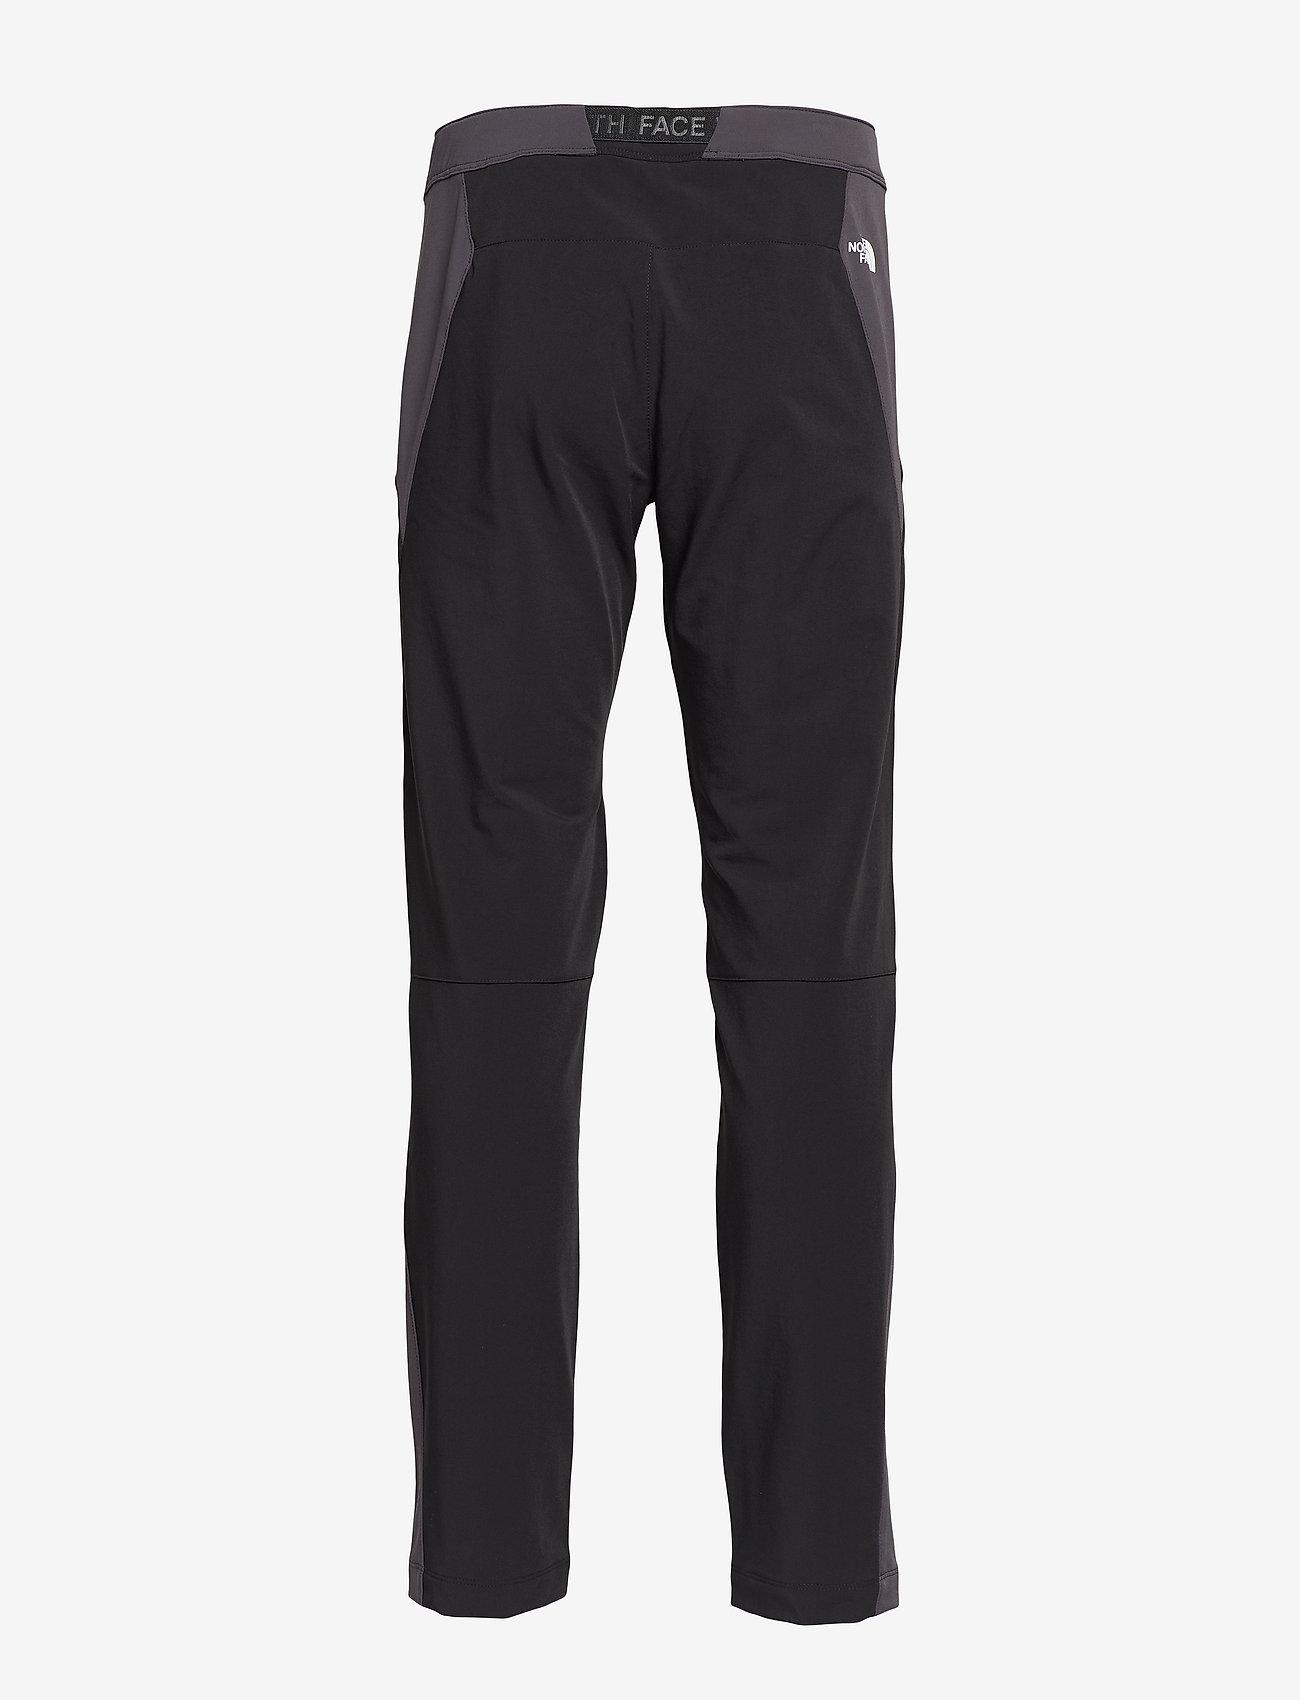 The North Face - M DIABLO II PANT - softshell pants - tnf black/acous - 1